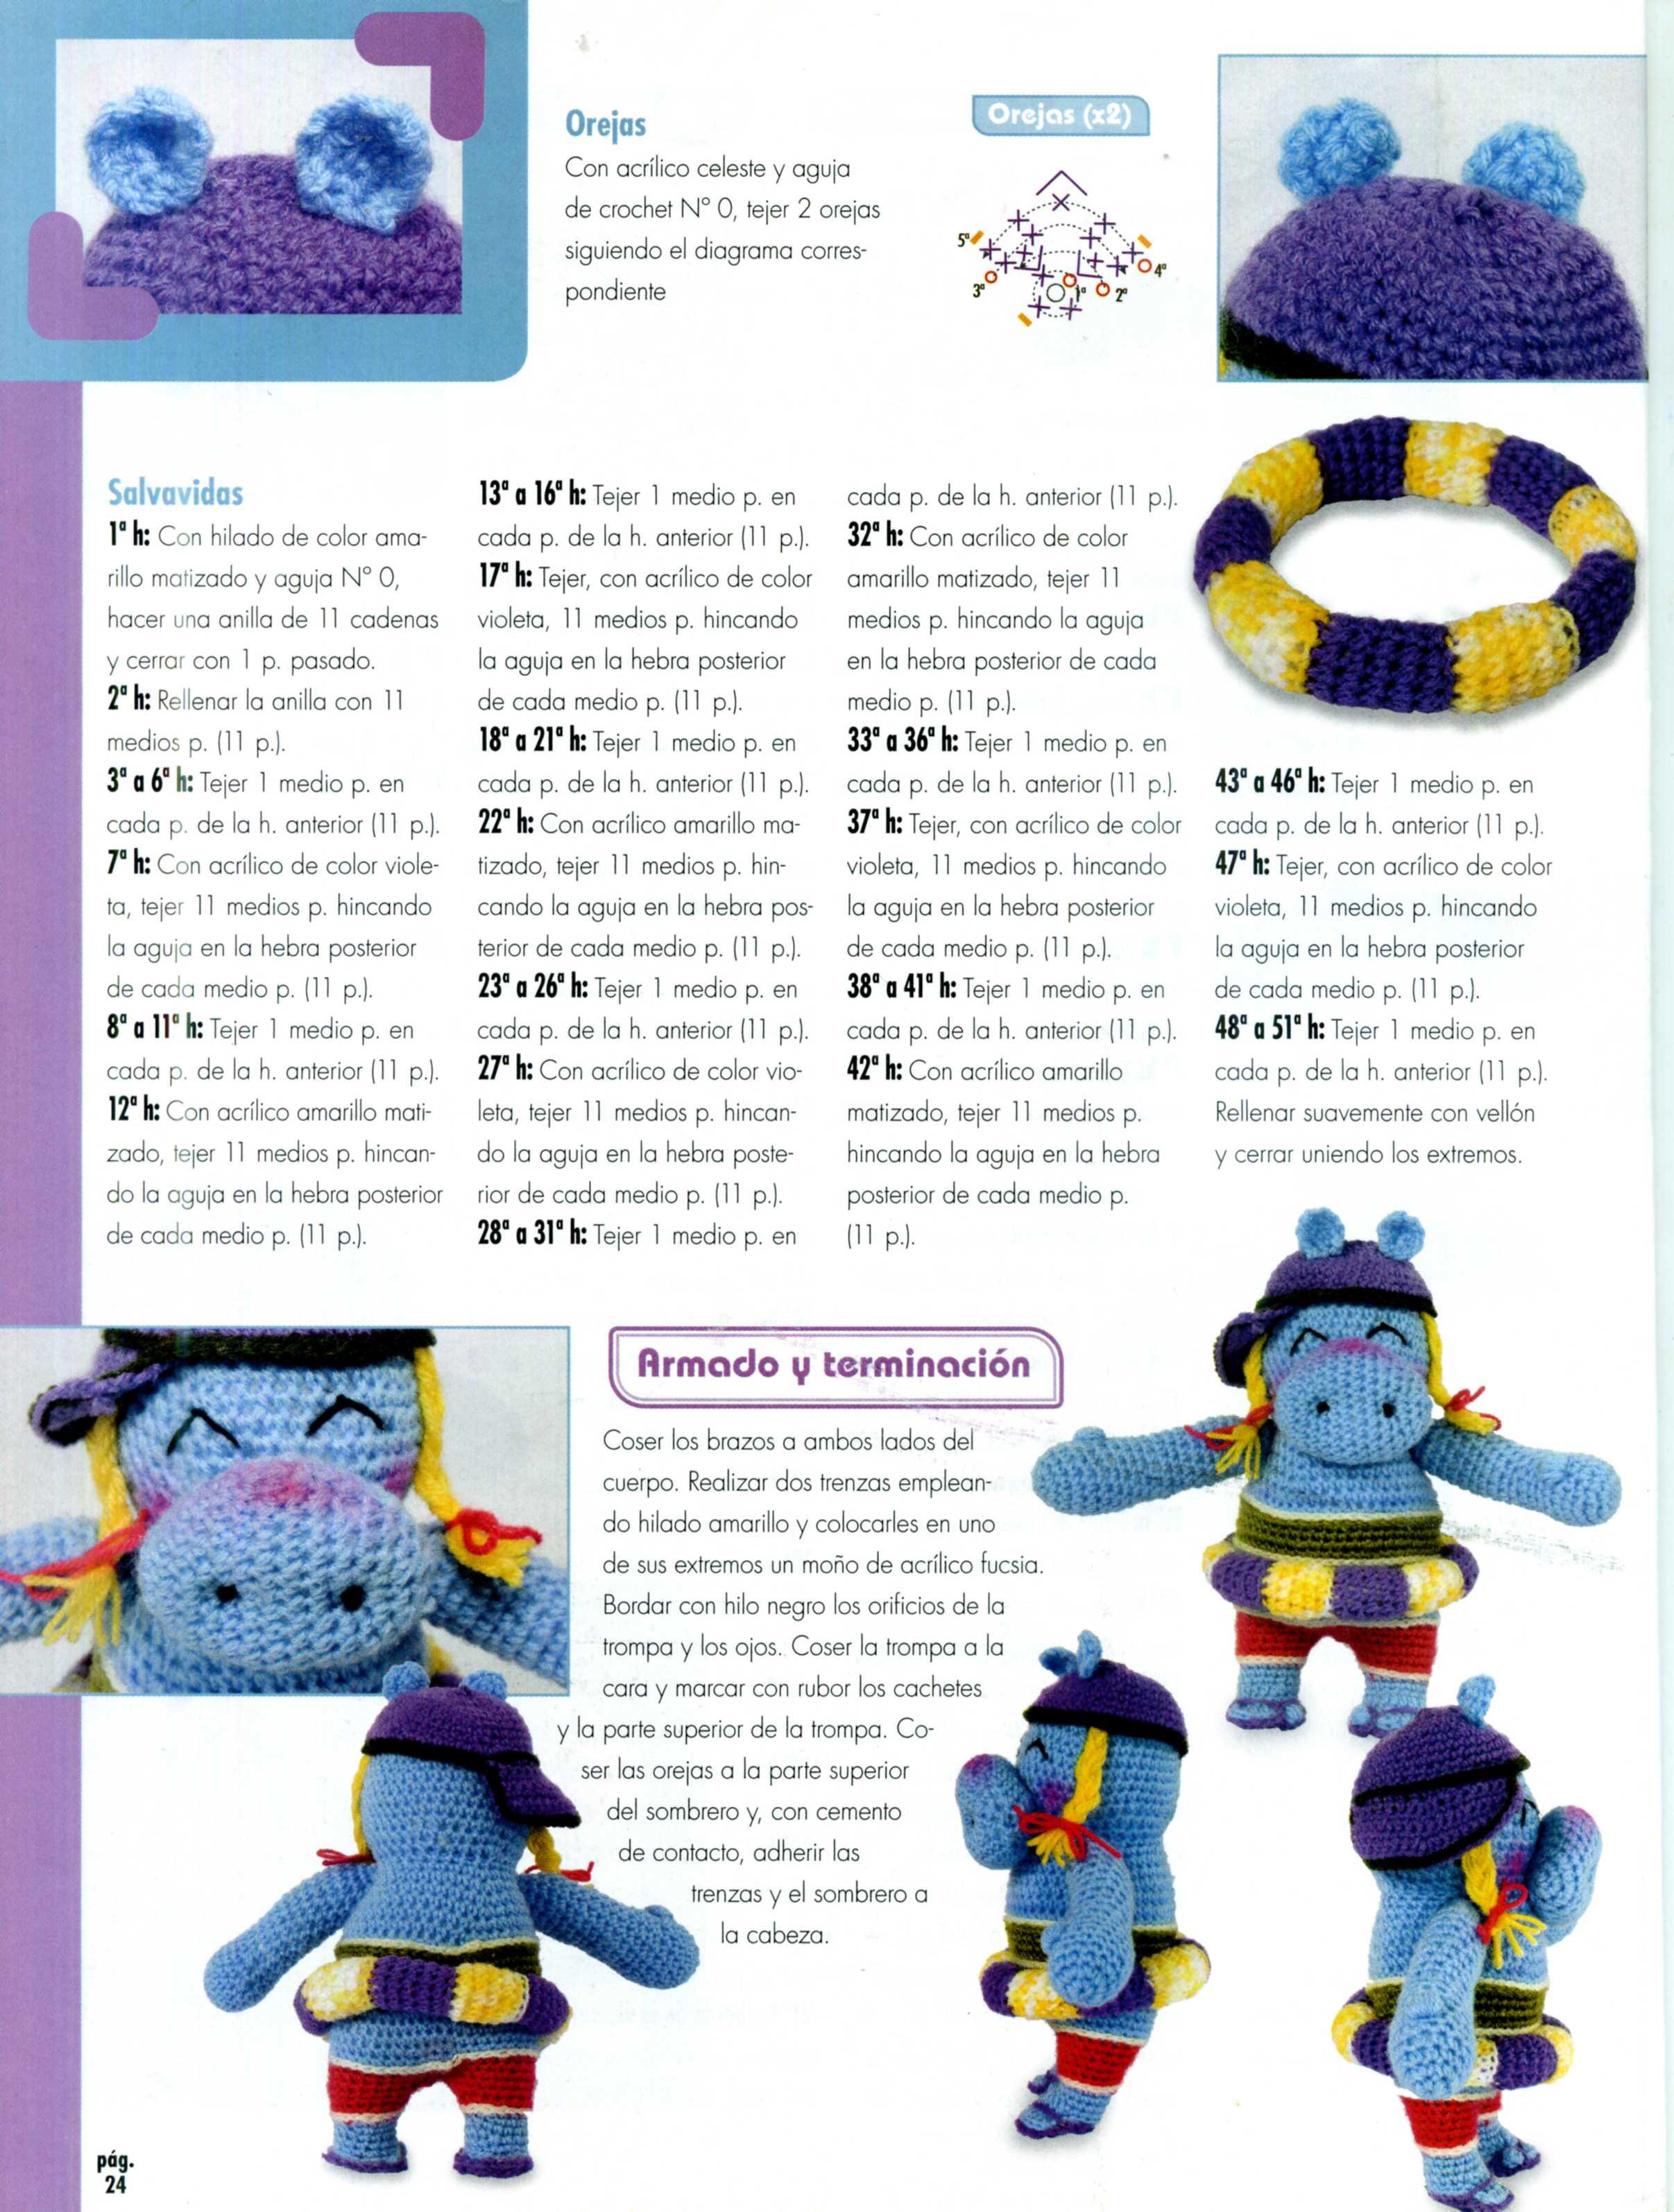 Ippopotamo Amigurumi Crochet : Ippopotamo a mare amigurumi 5 - magiedifilo.it punto croce ...